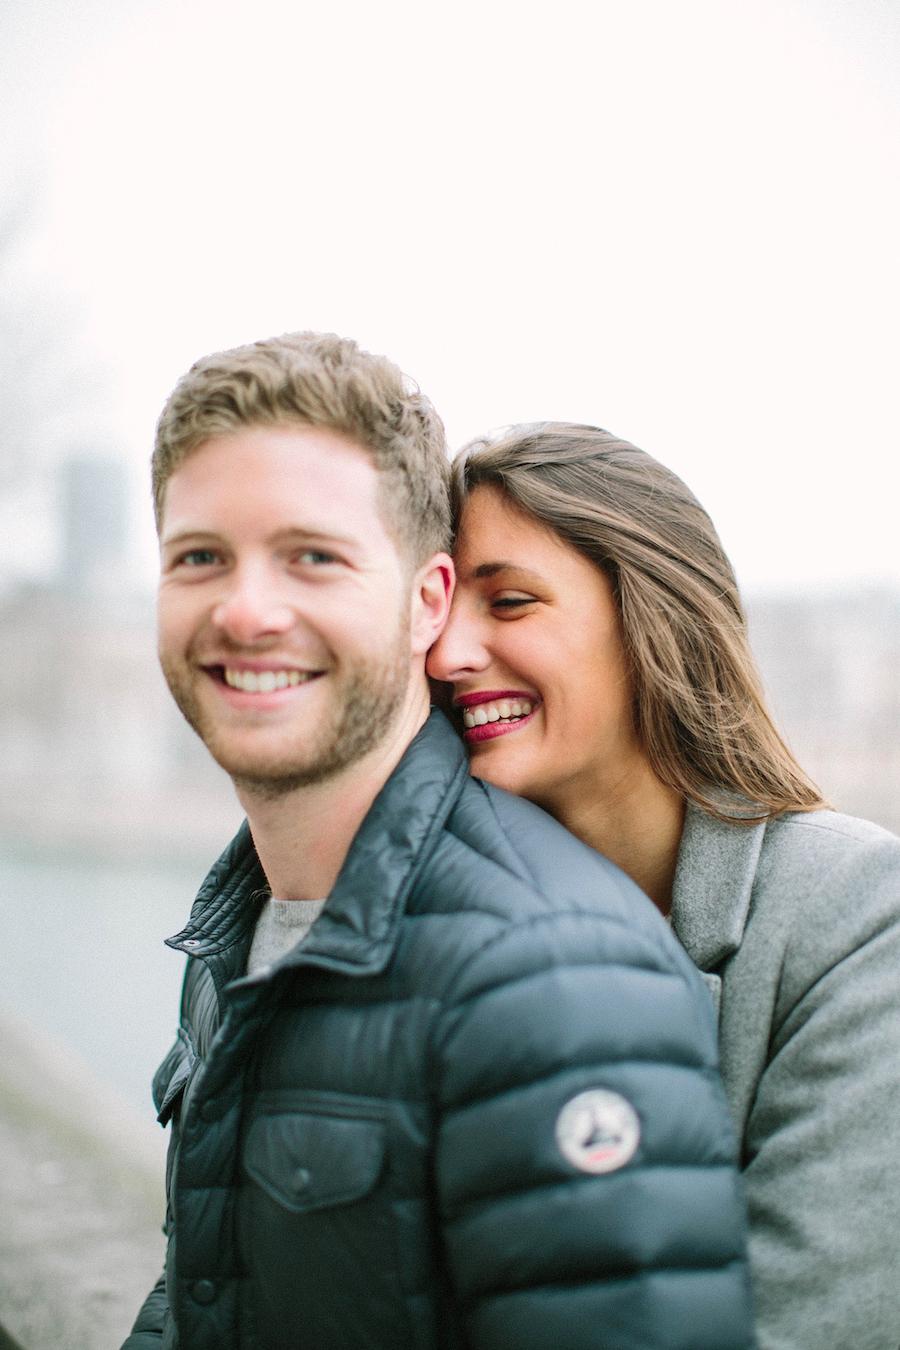 saya-photography-pre-wedding-couple-engagement-paris-quartier-latin-41.jpg